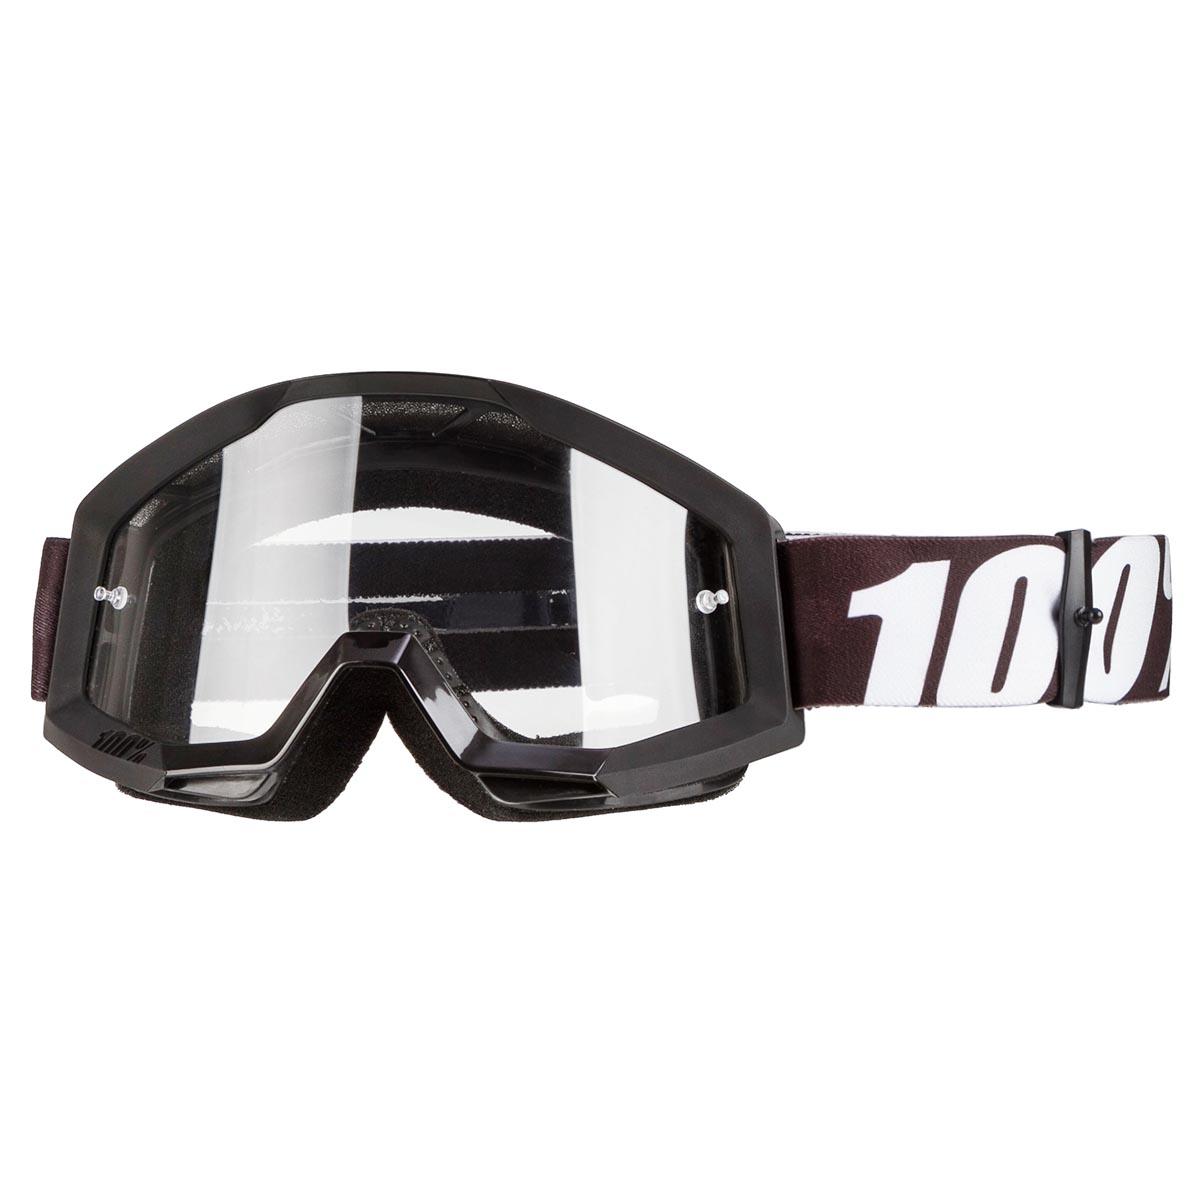 100% Crossbrille The Strata Outlaw - Klar Anti-Fog